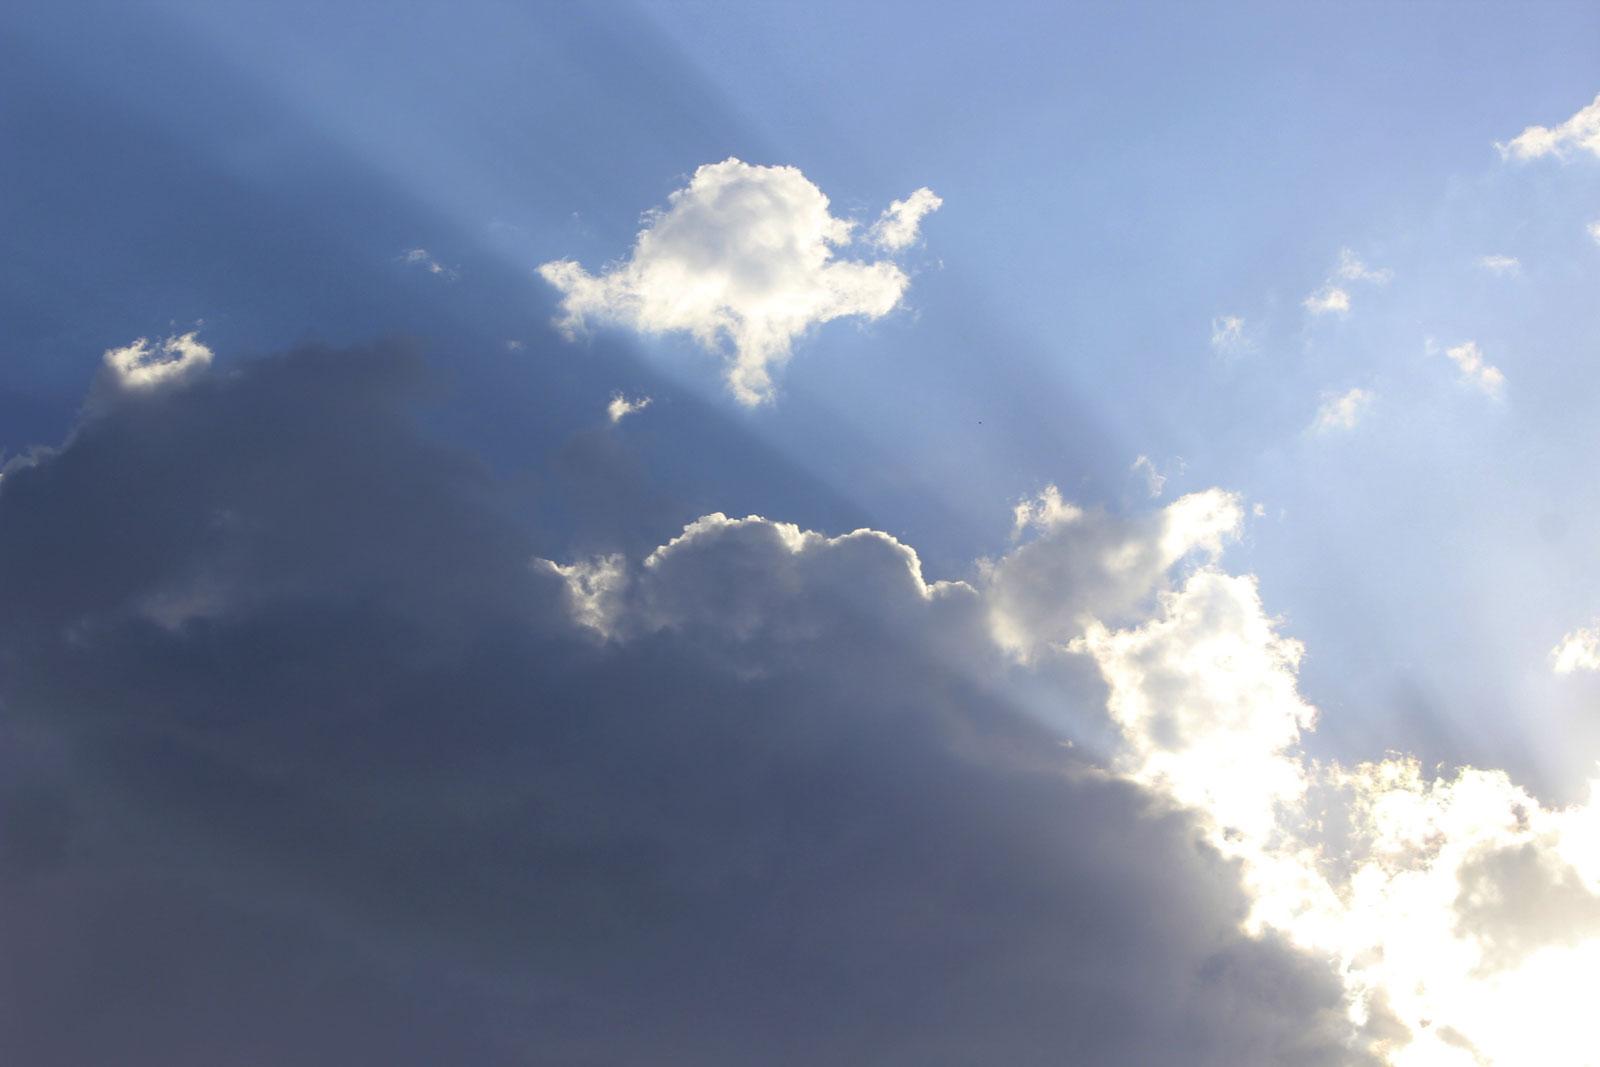 Bush clouds